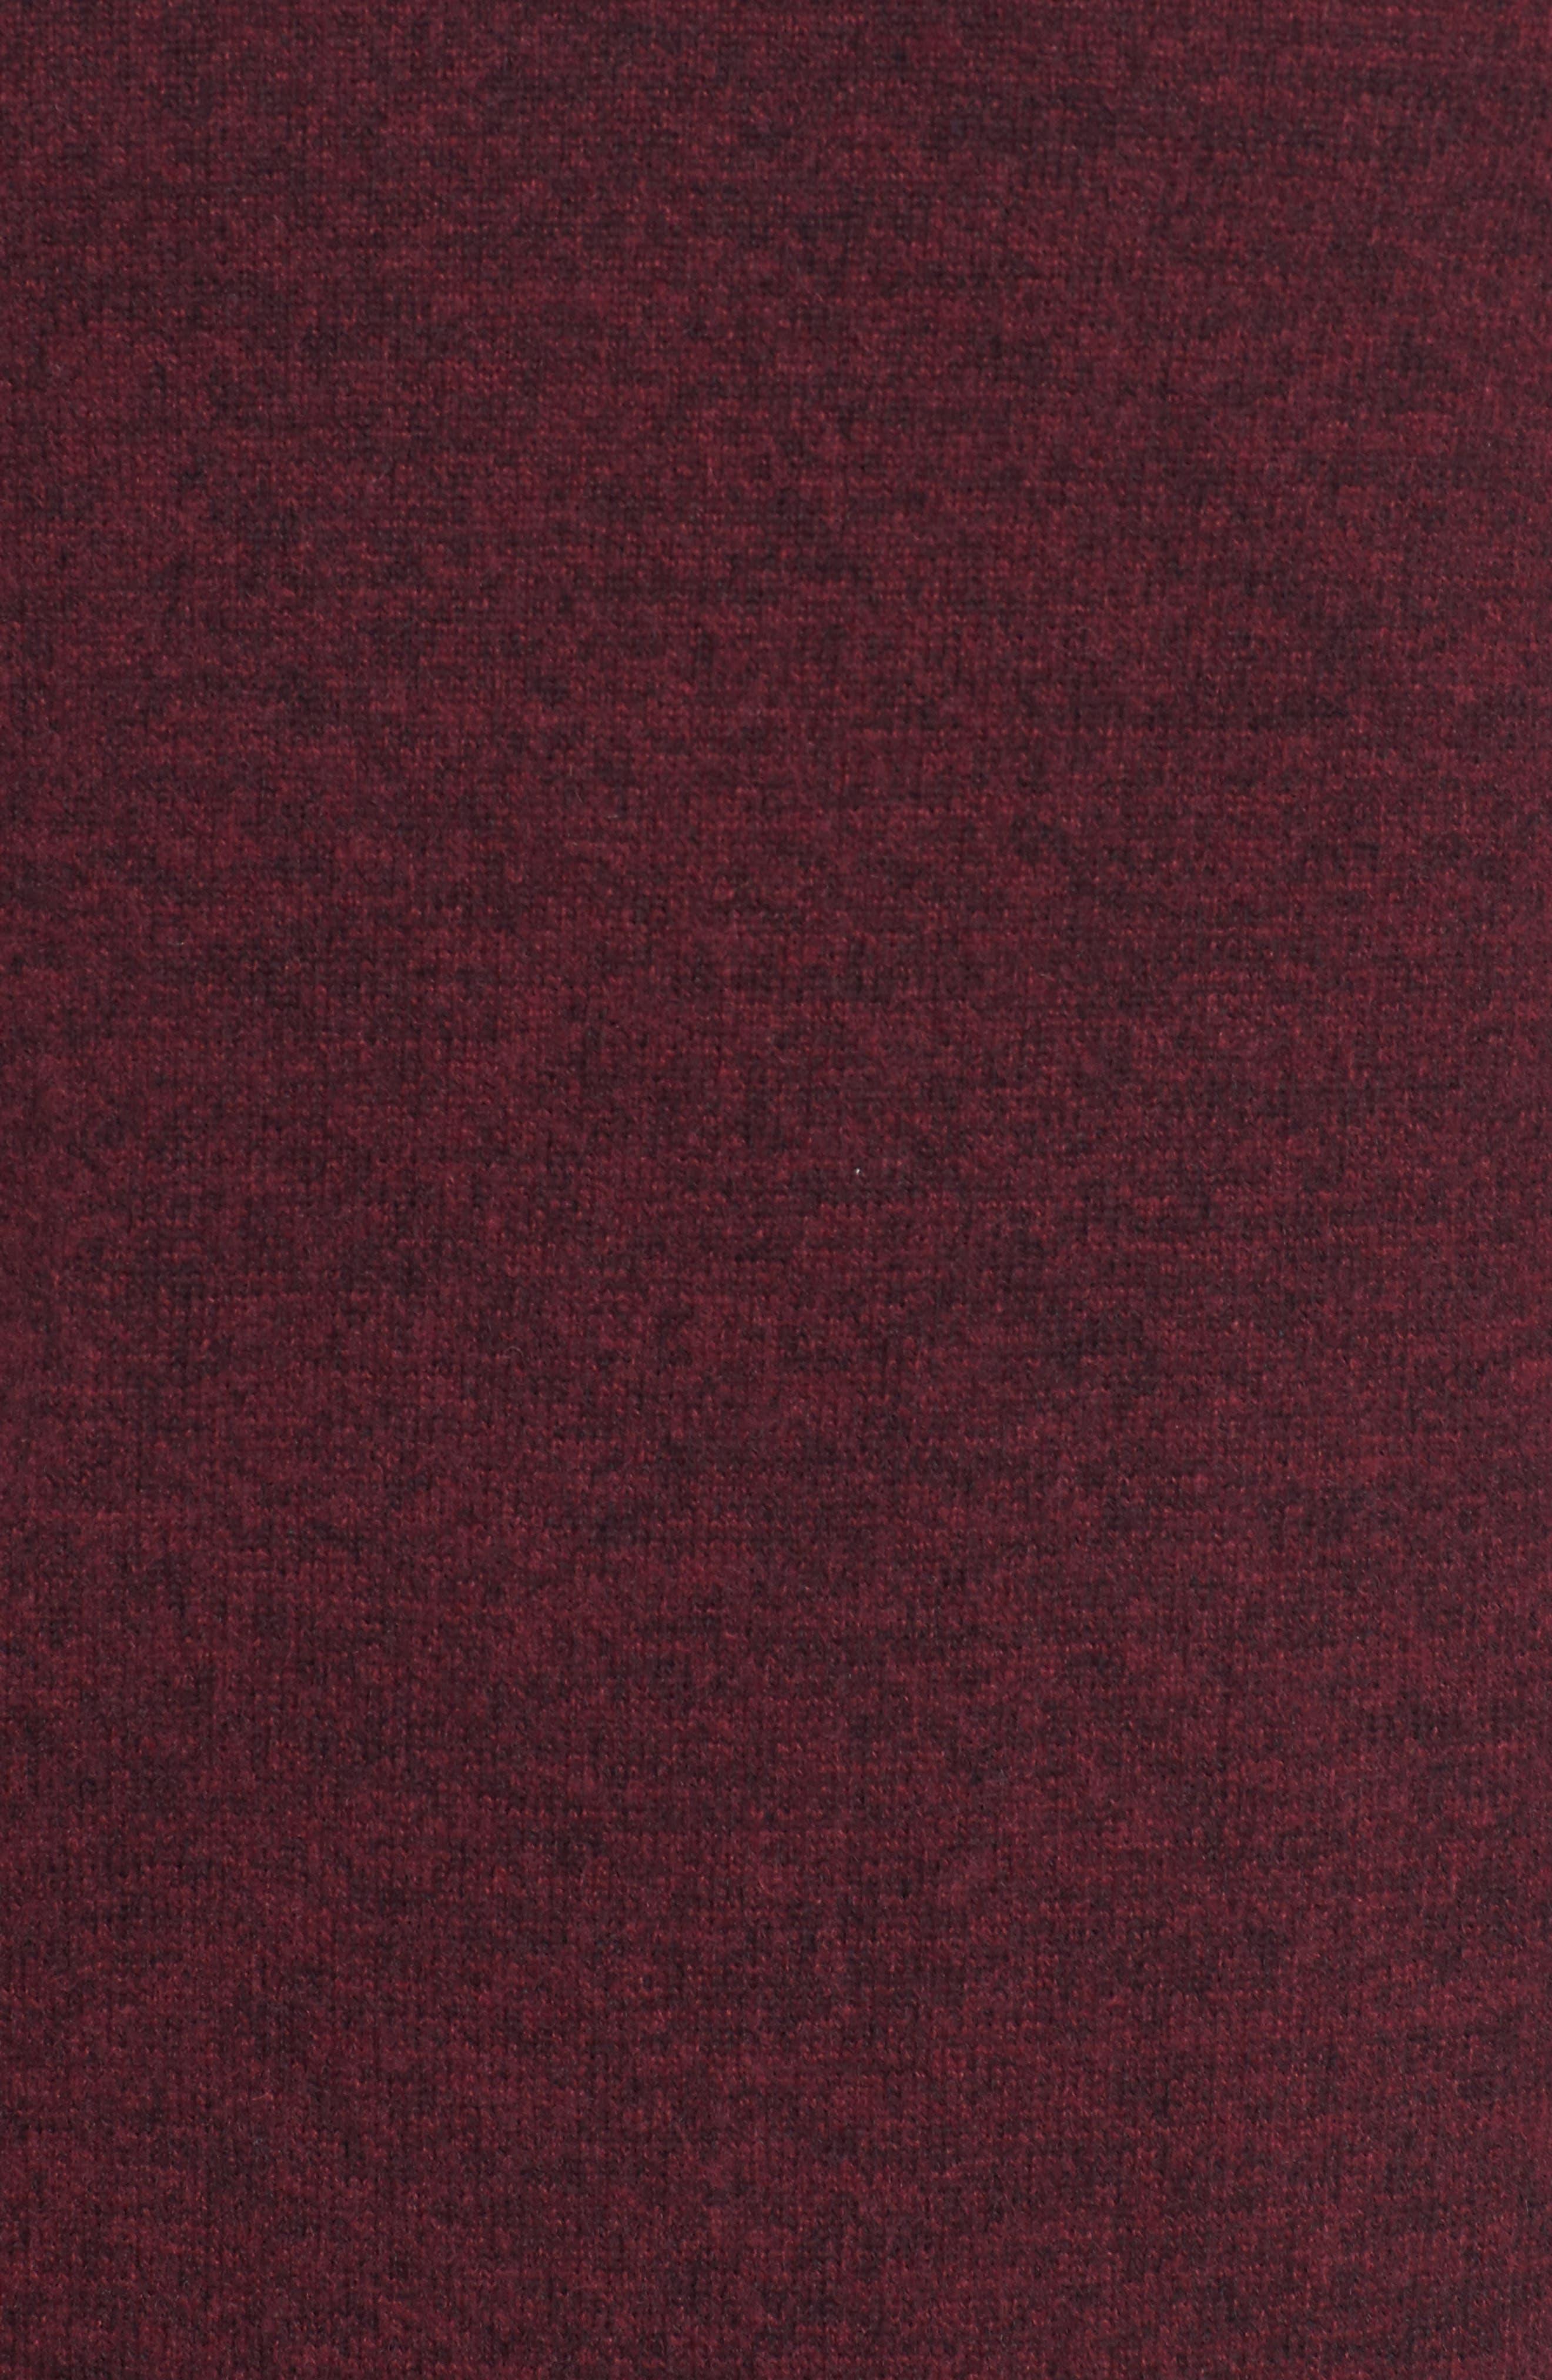 Boiled Wool Blend Crewneck Sweater,                             Alternate thumbnail 5, color,                             Burgundy Stem